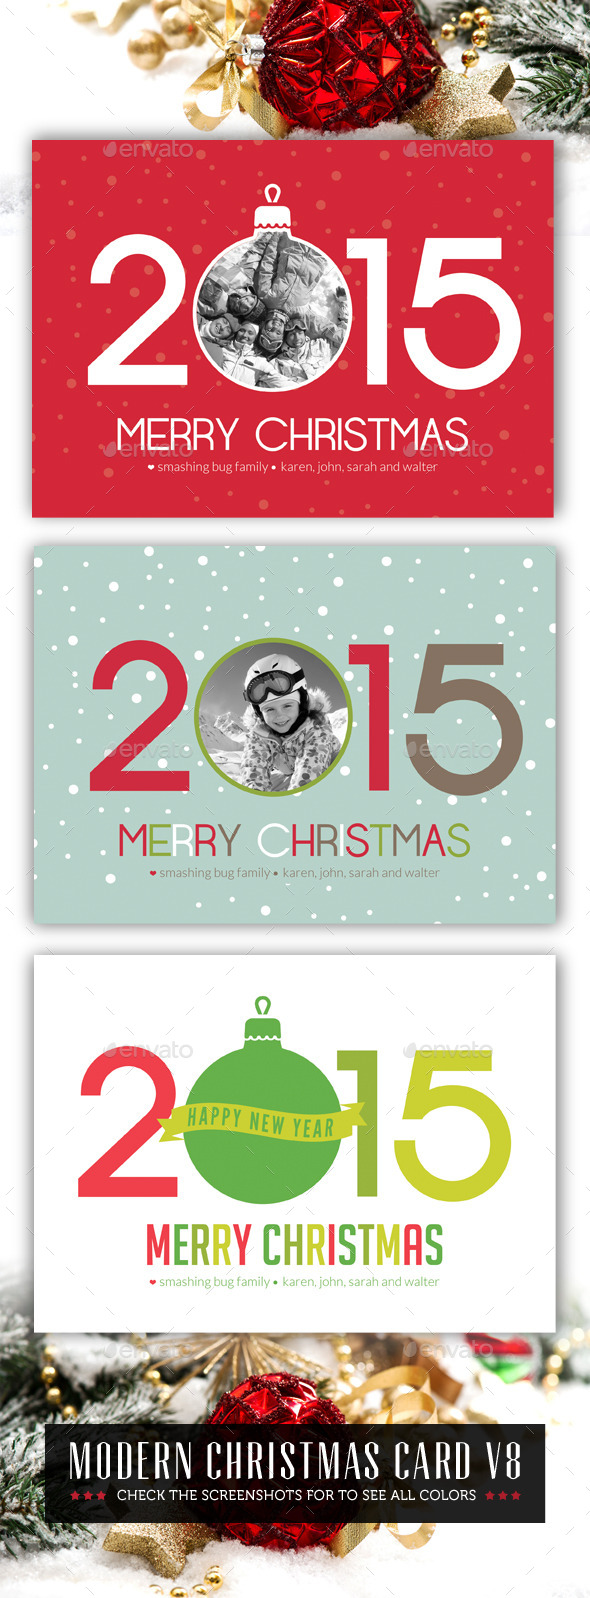 Modern Christmas Card V8 - Holiday Greeting Cards